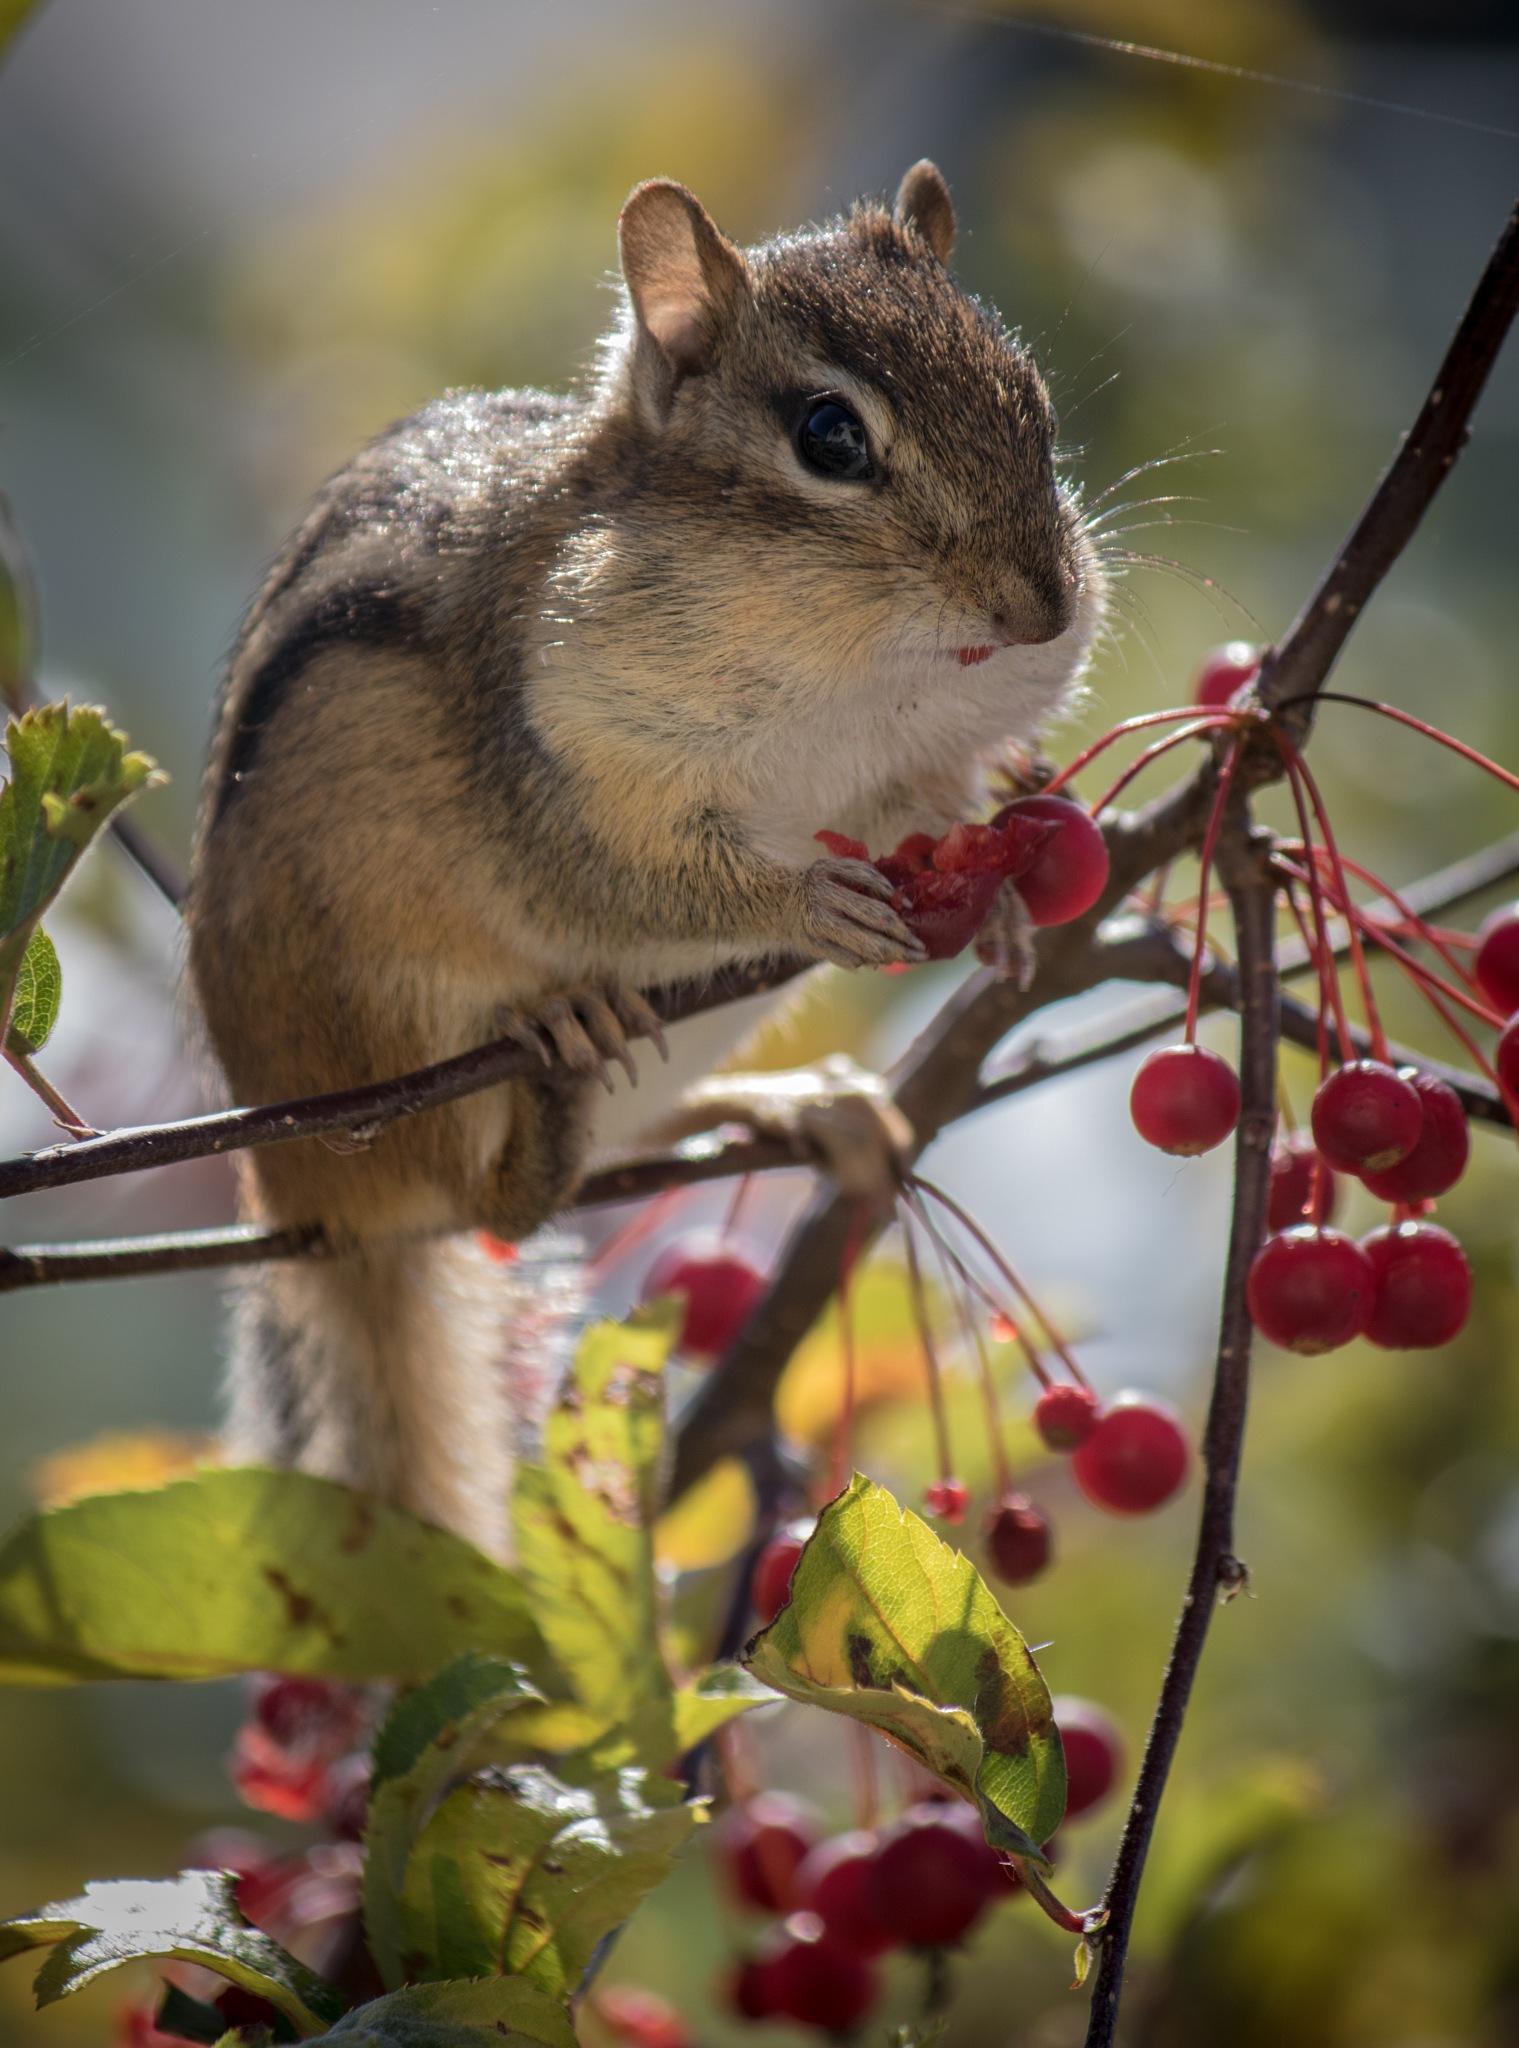 Chipmunk by Patrick Bogan